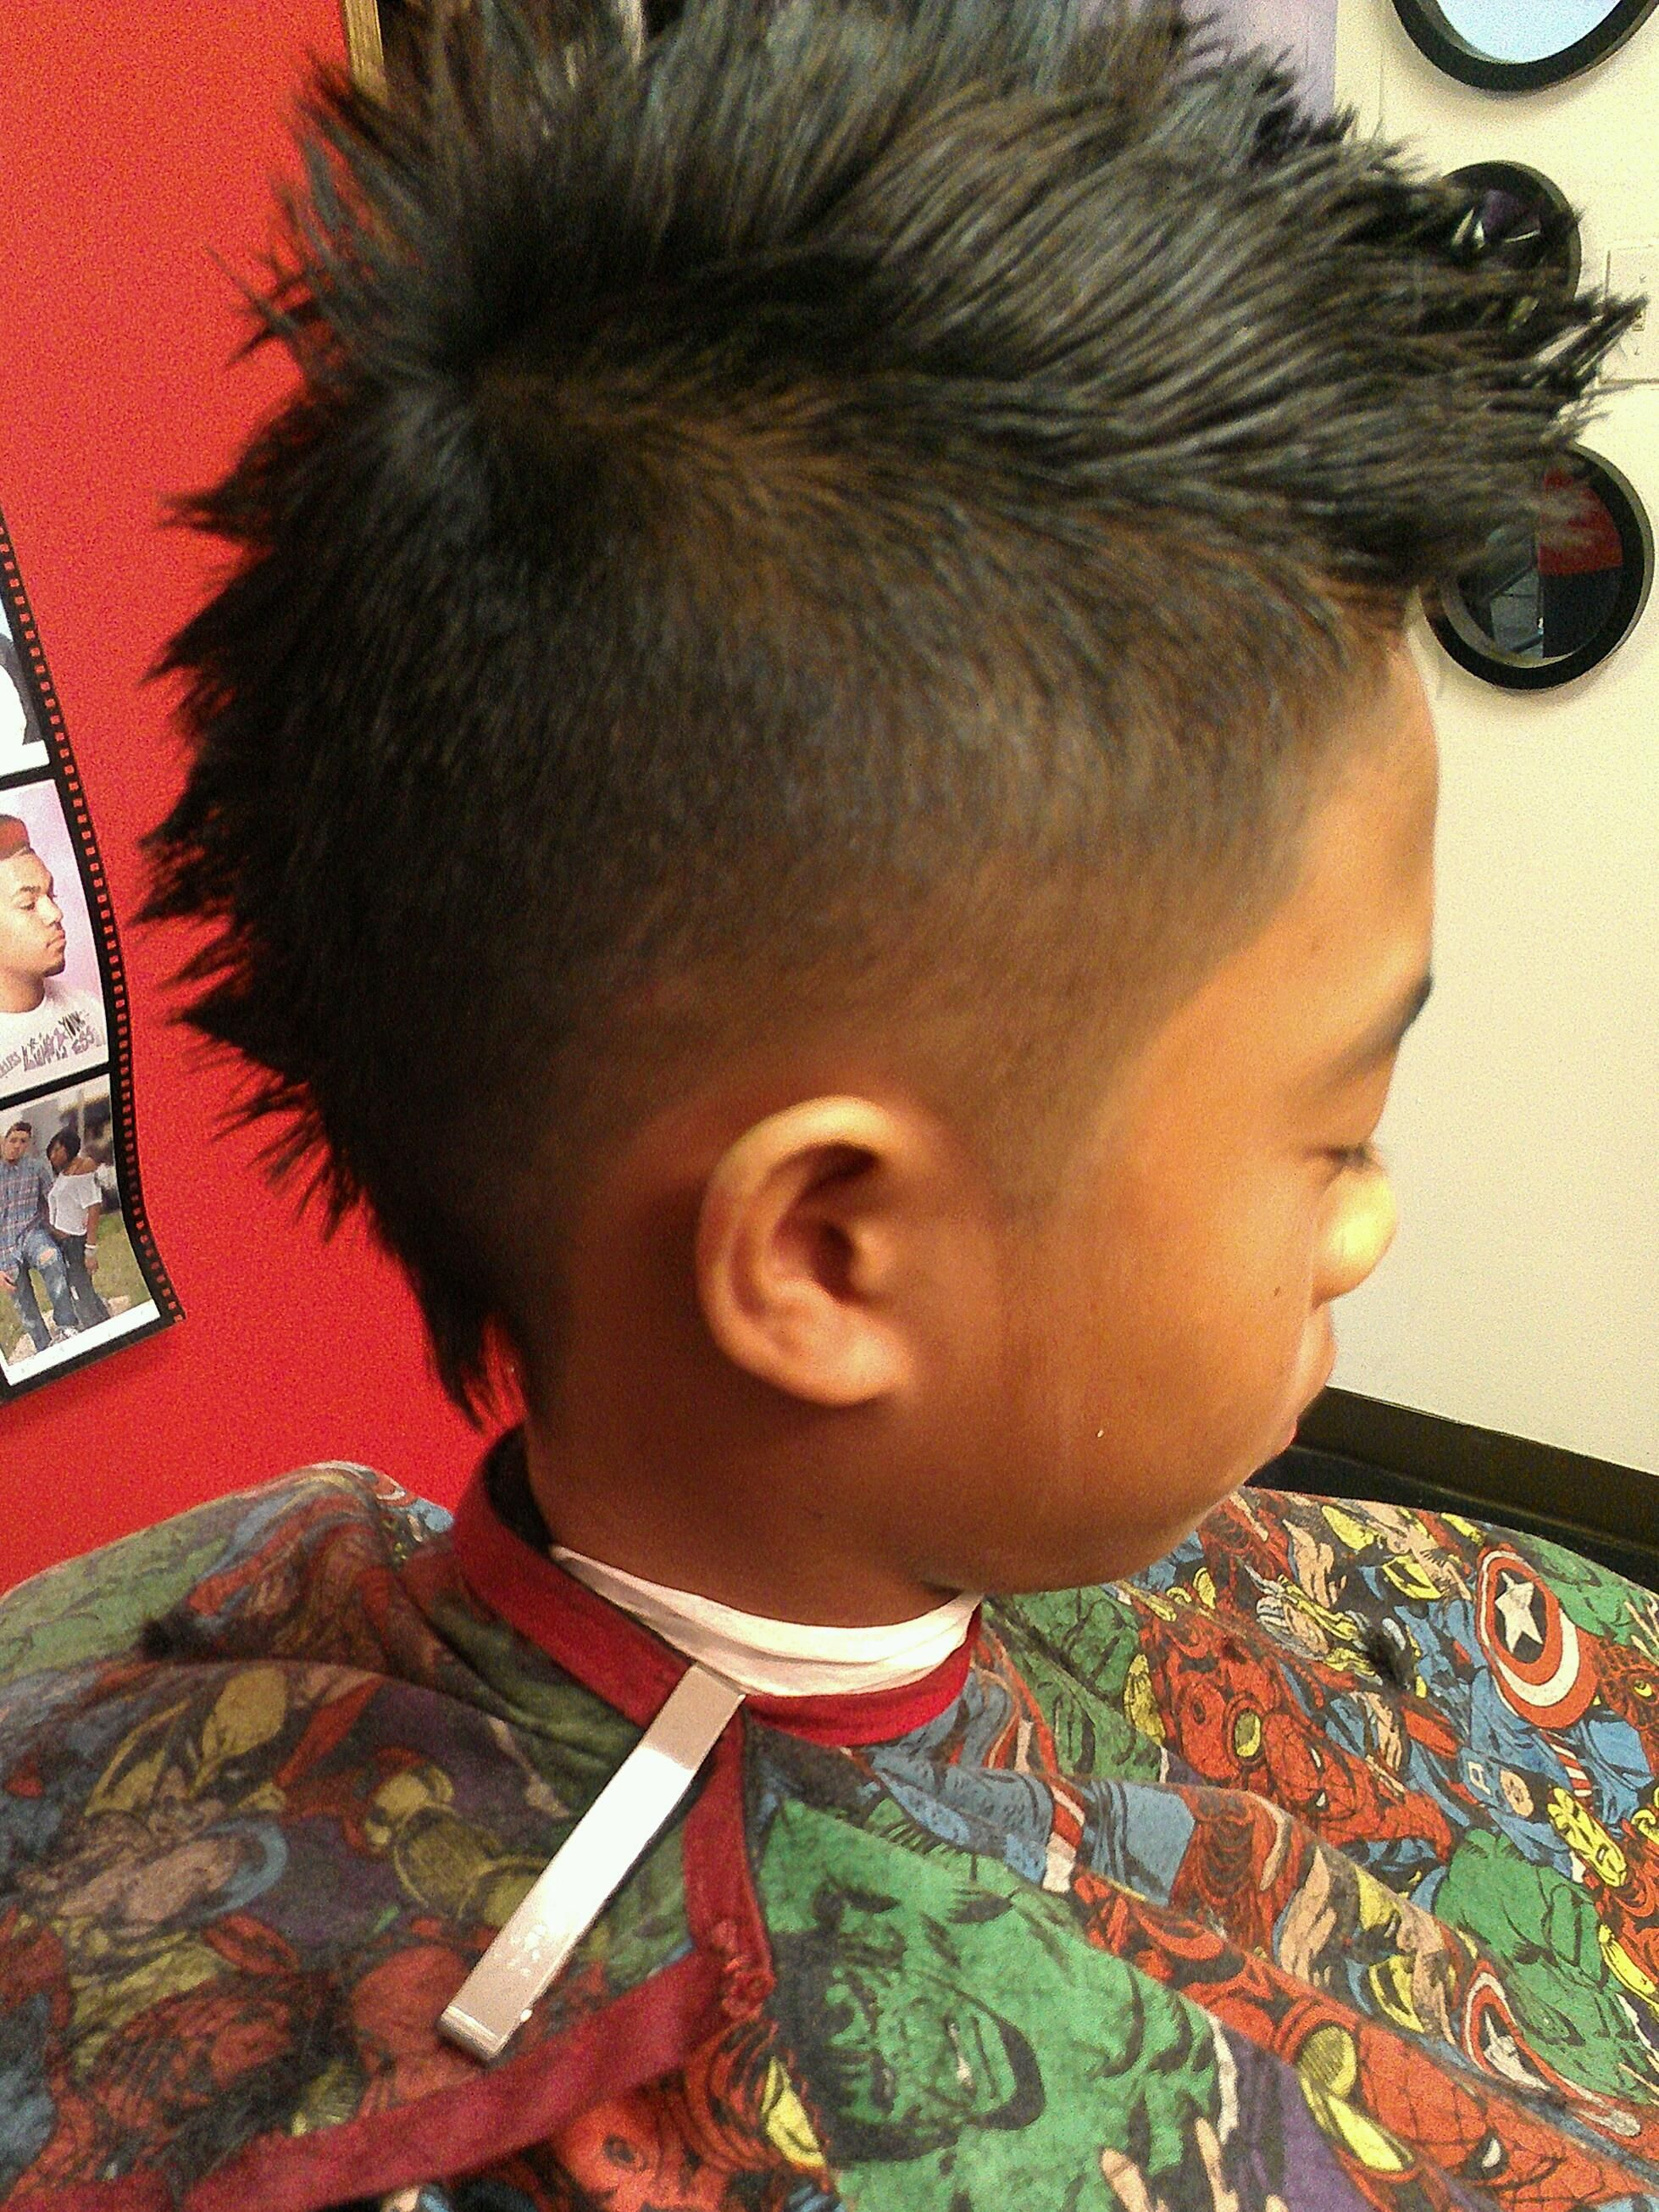 Mohawk fade superstarbarber barbershop little boy haircut